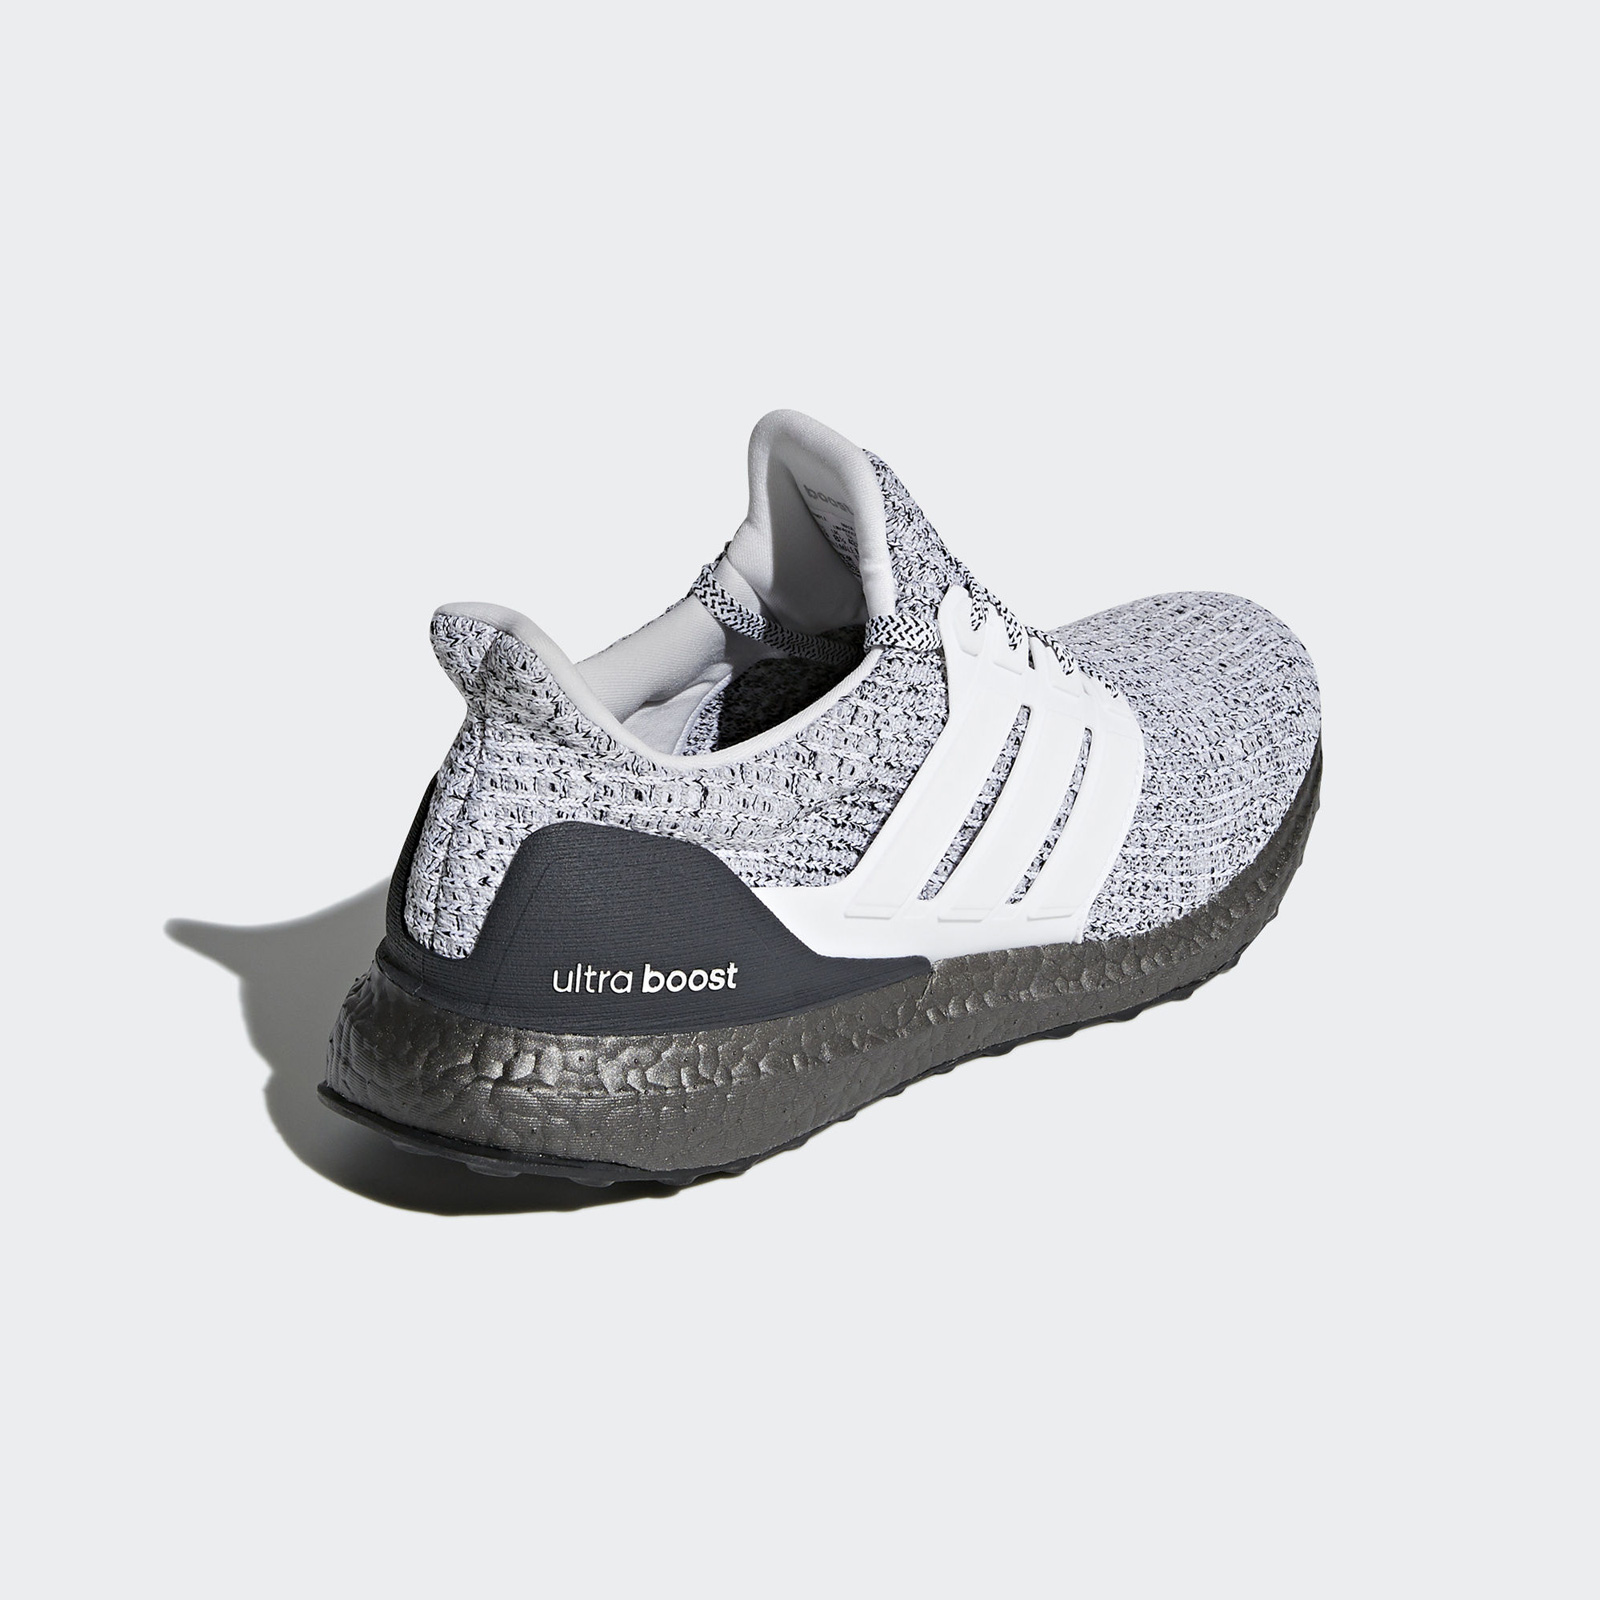 2eeb43052d6 adidas UltraBOOST - Bb6180 - Sneakersnstuff